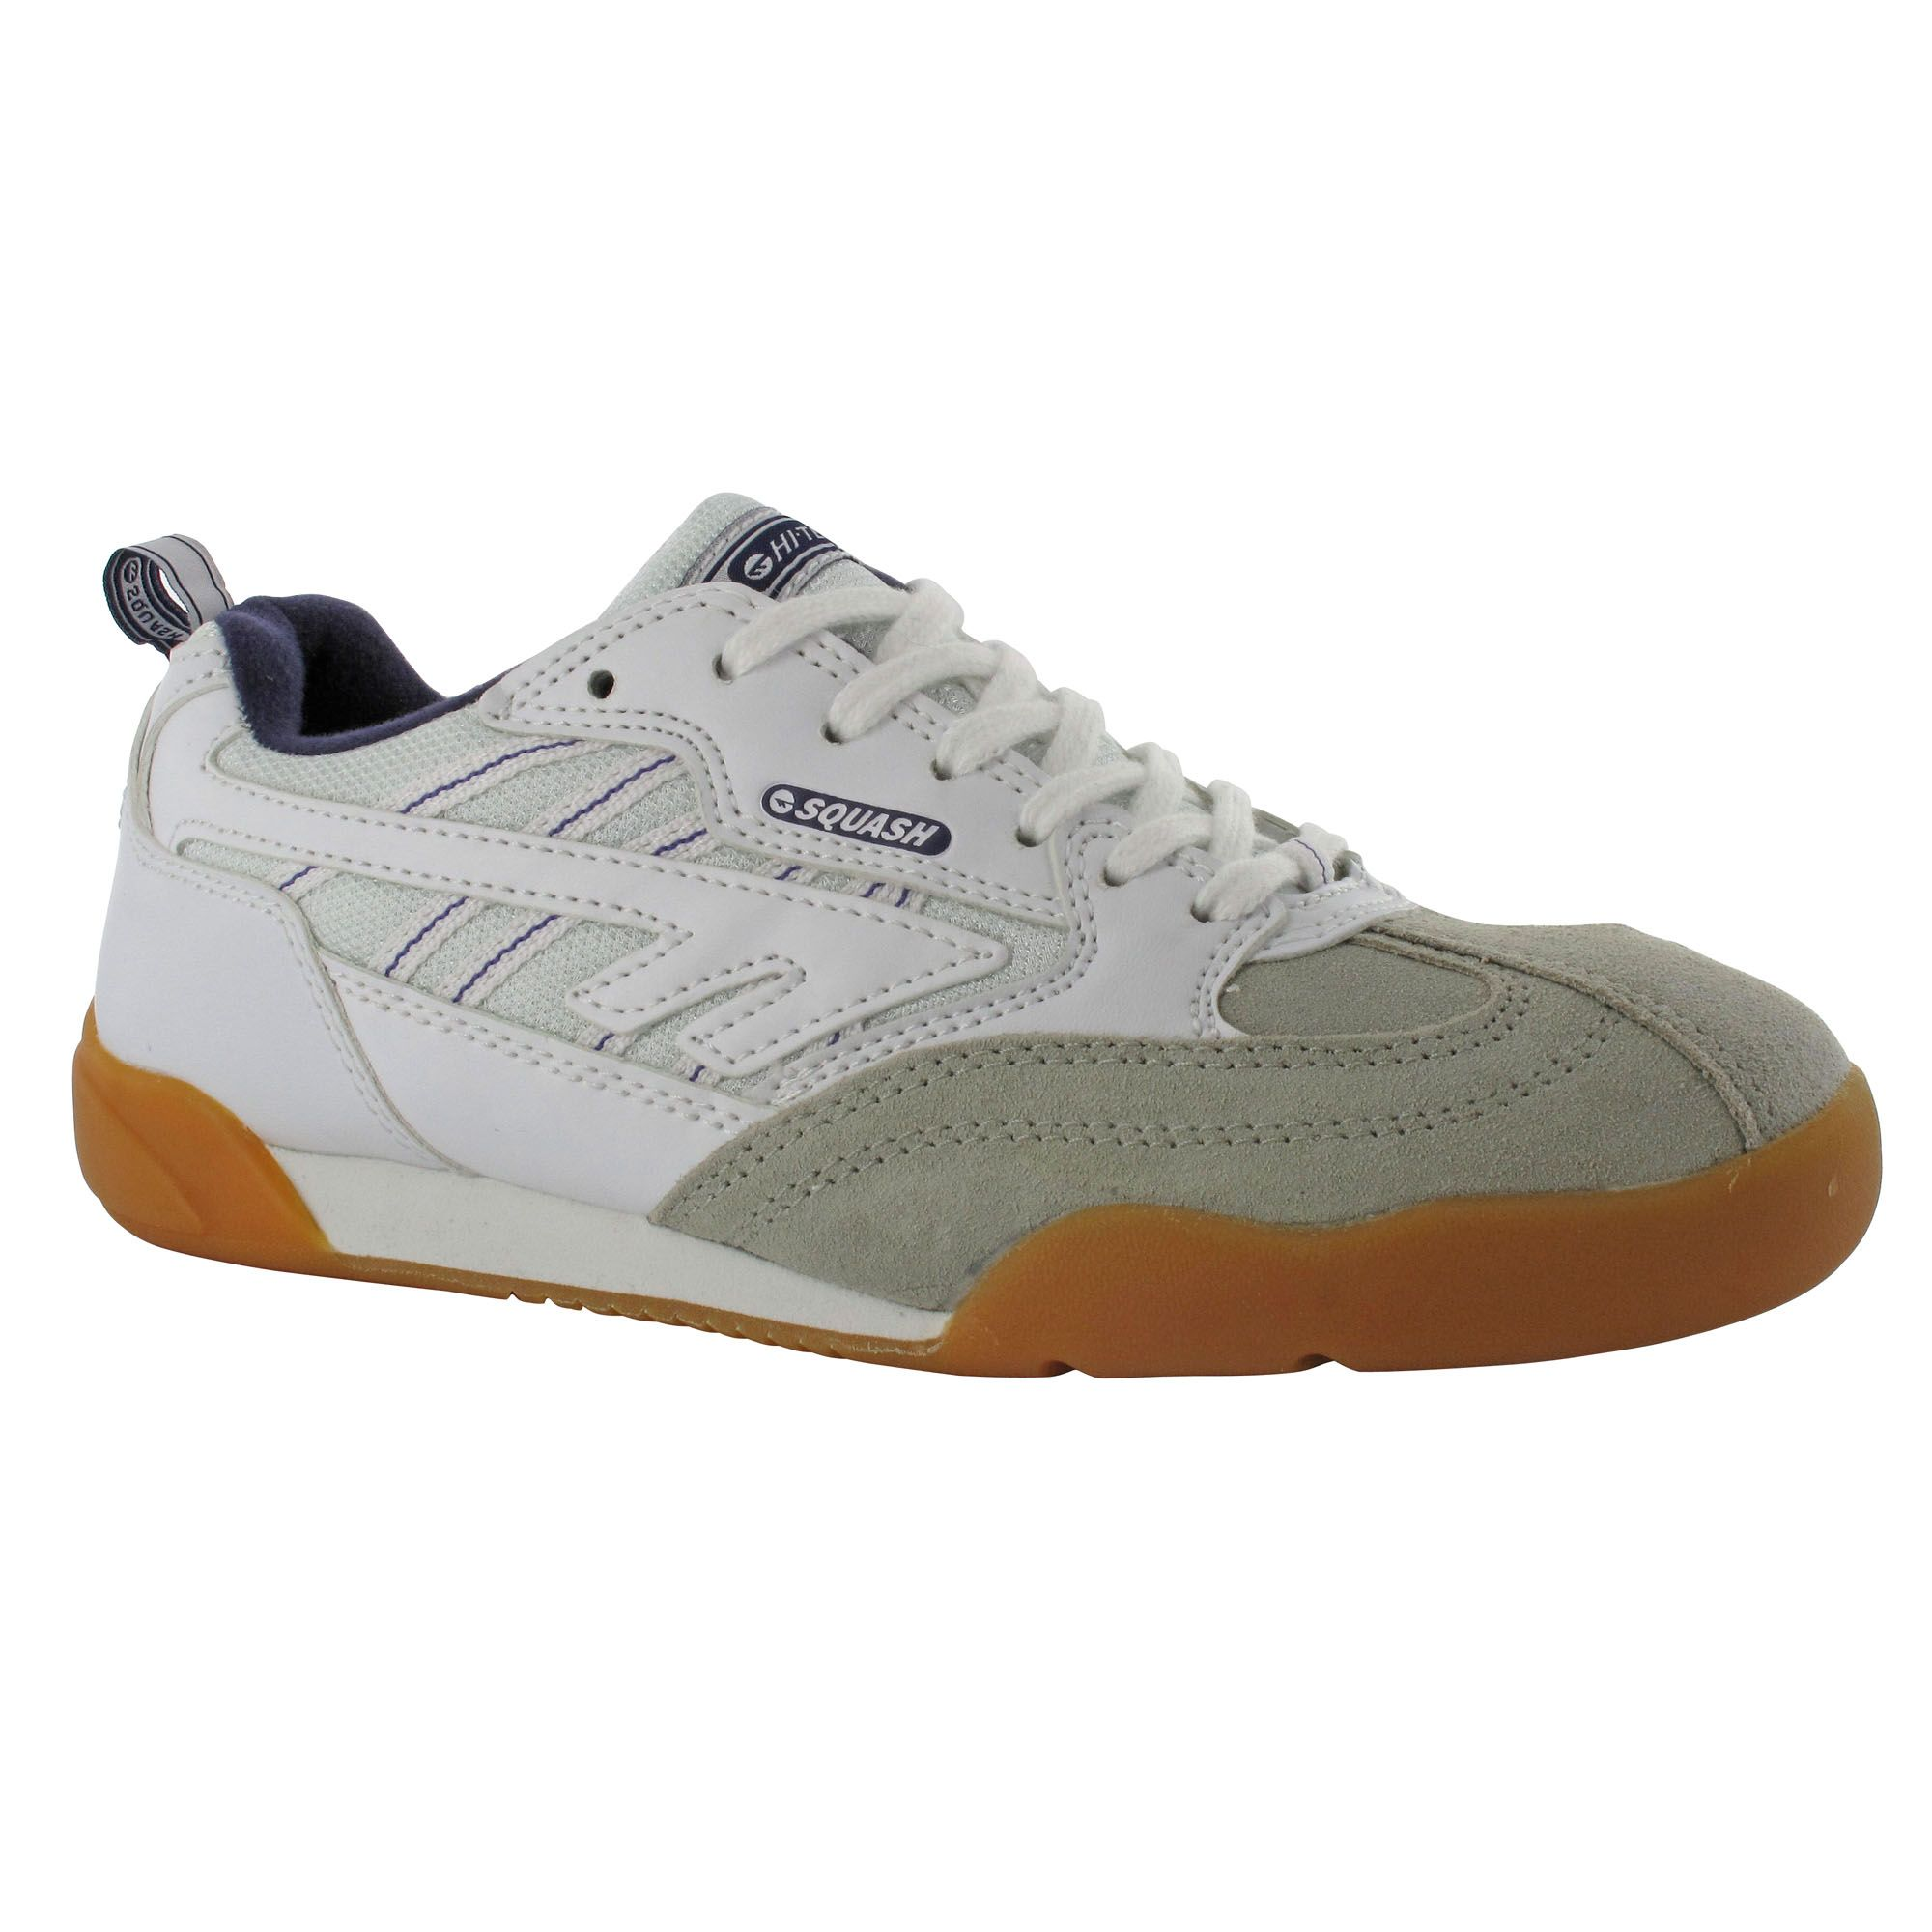 classic_womens_shoes_hi-tec_squash_classic_womens_shoes_2000x2000.jpg